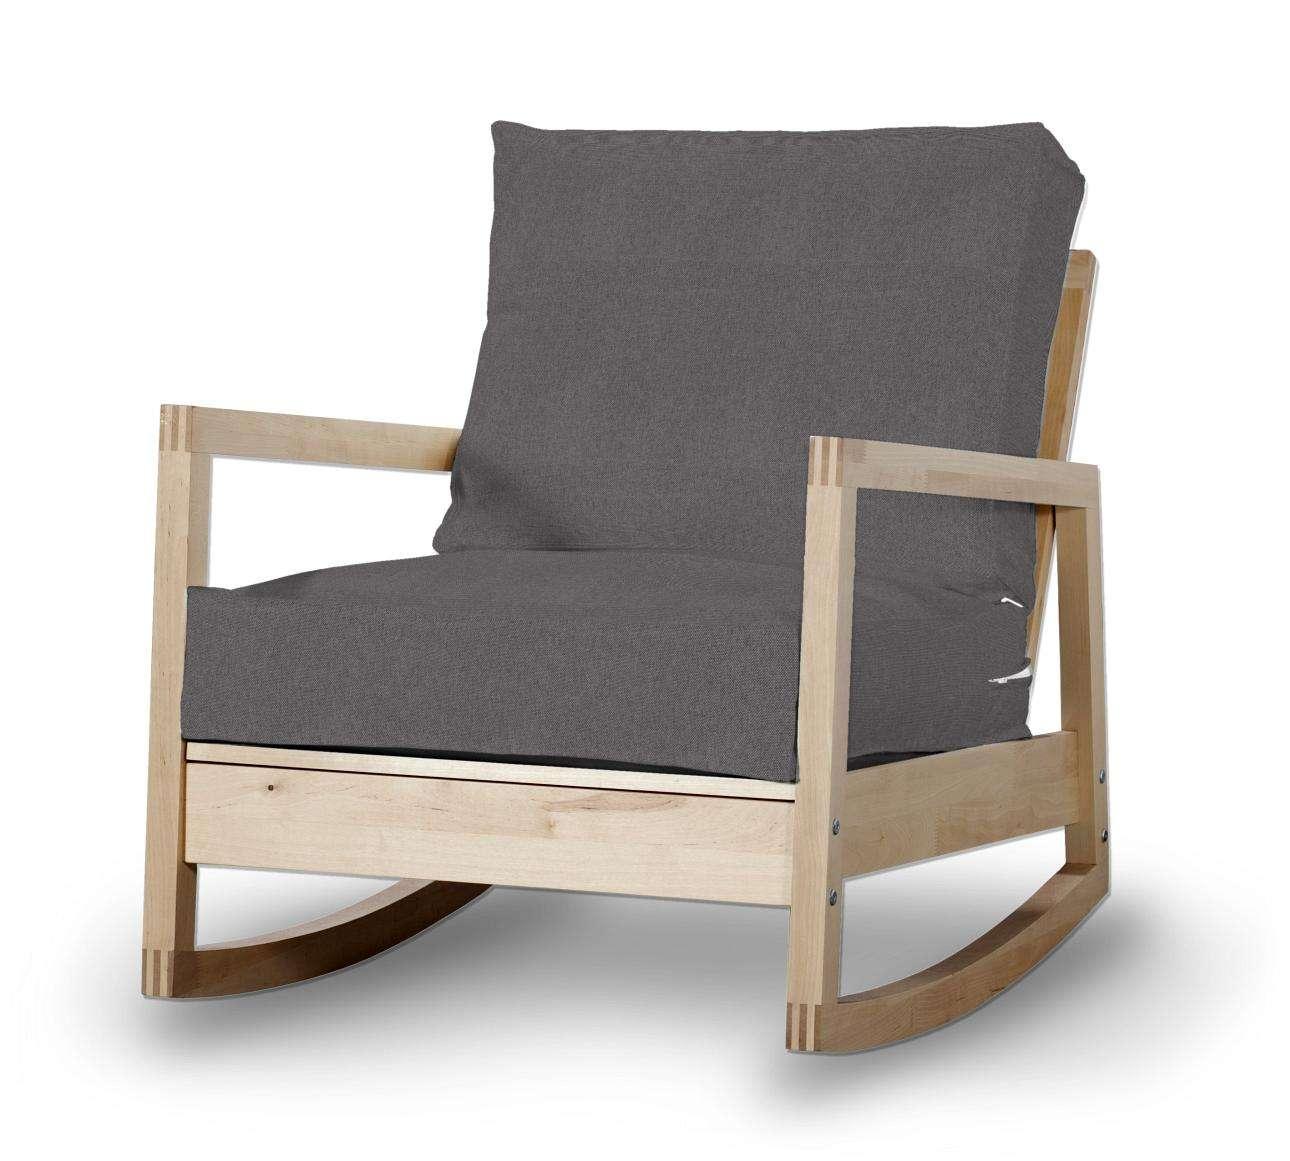 Lillberg Sesselbezug Sesselhusse, Modell Lillberg von der Kollektion Etna, Stoff: 705-35